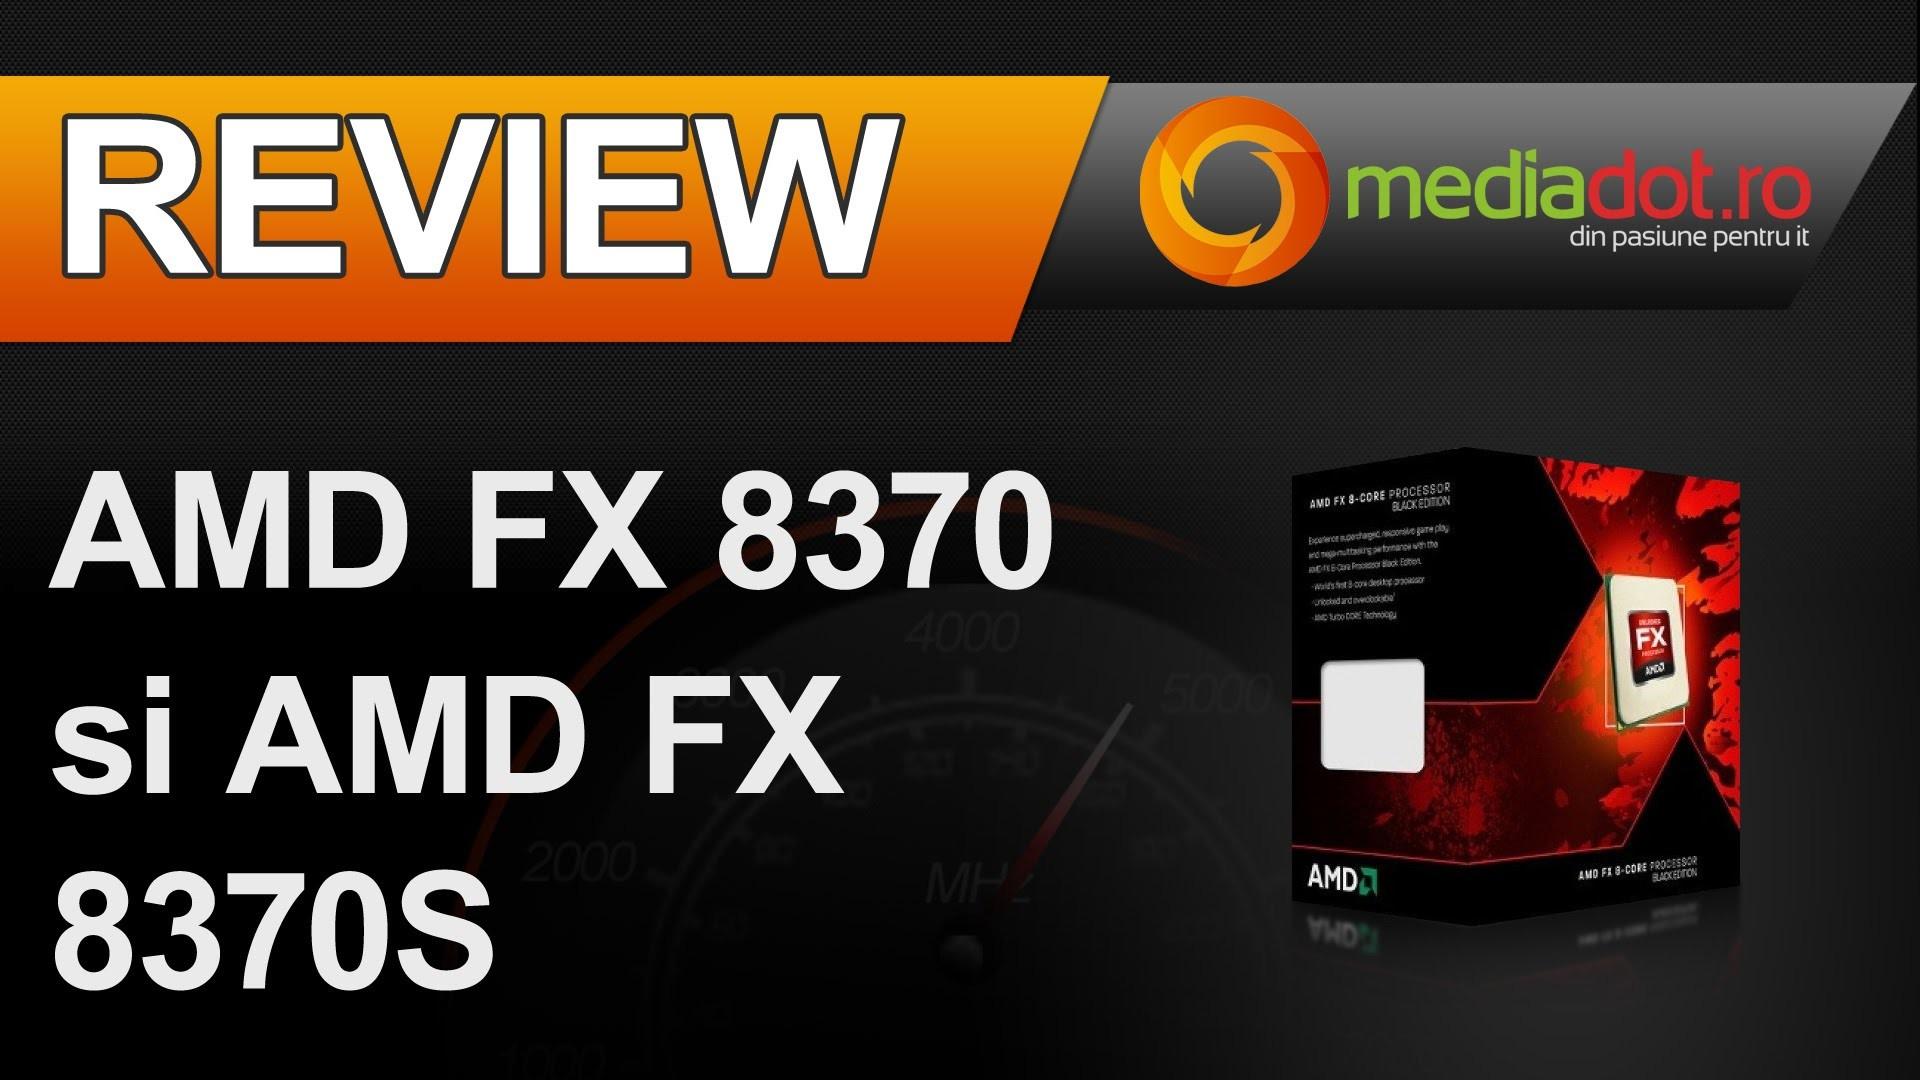 AMD FX 8370 si AMD FX 8370E – Review MediaDOT.ro